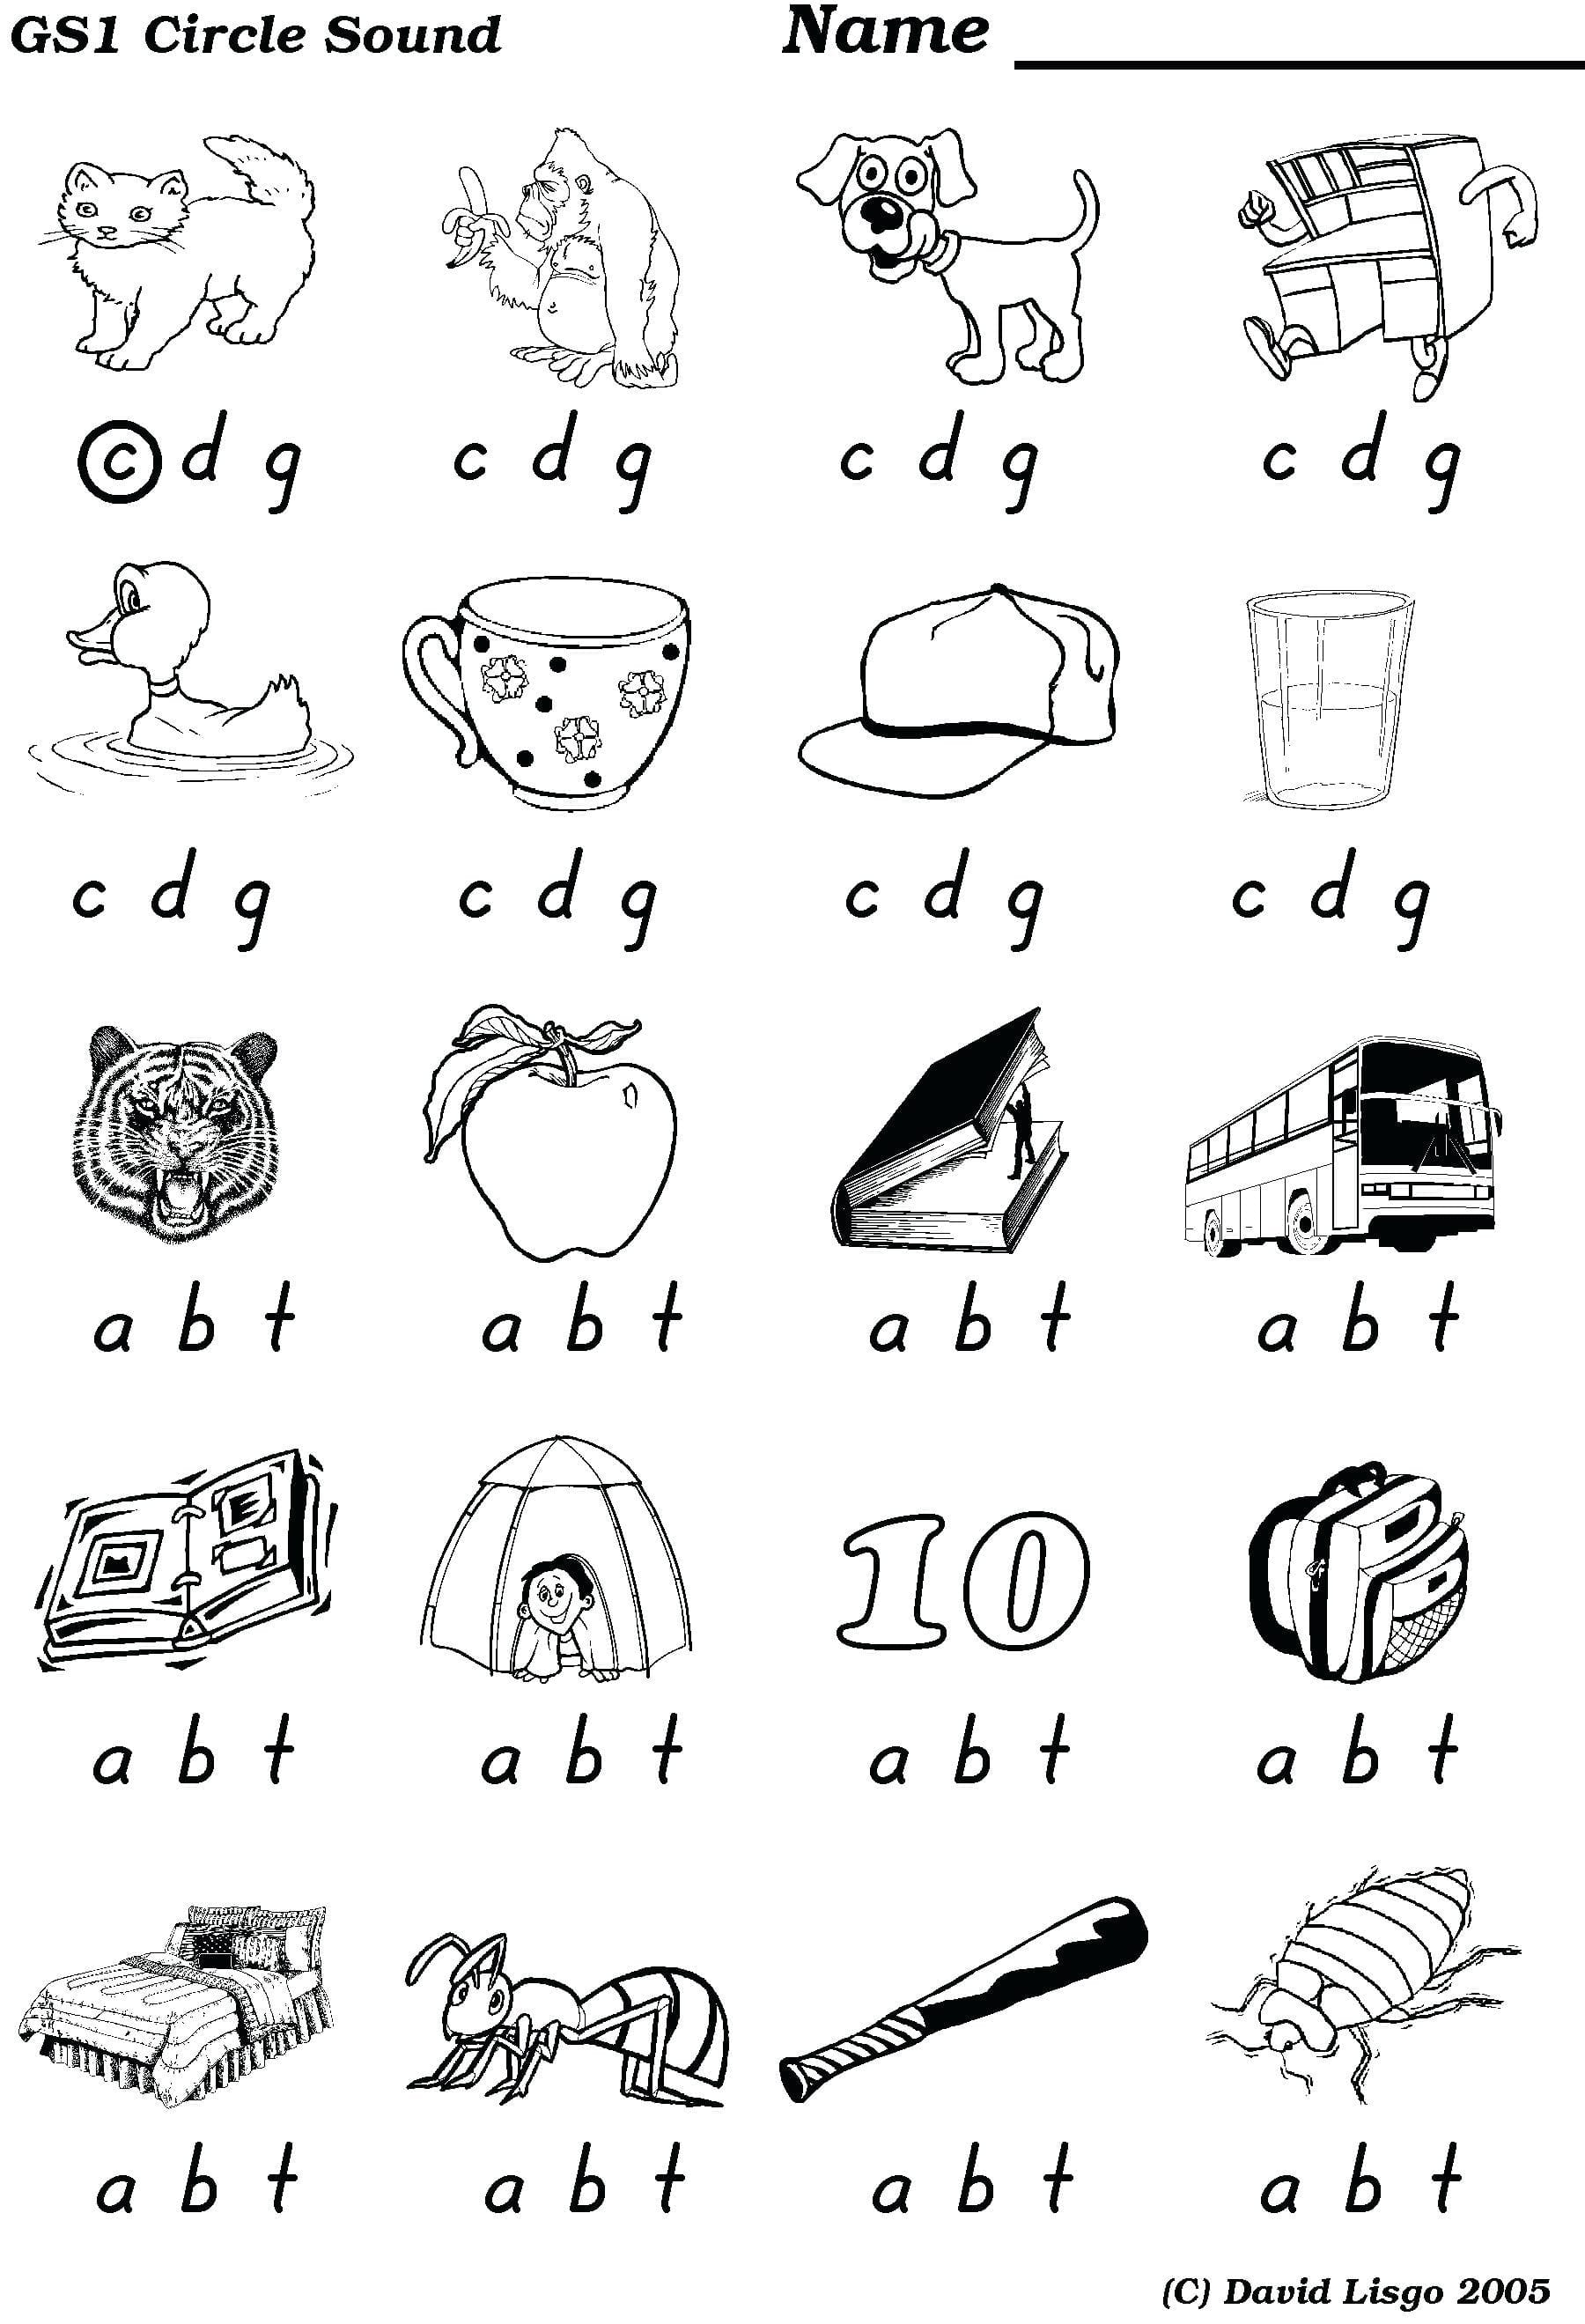 Final Consonant Sounds Worksheets Reddogsheetco